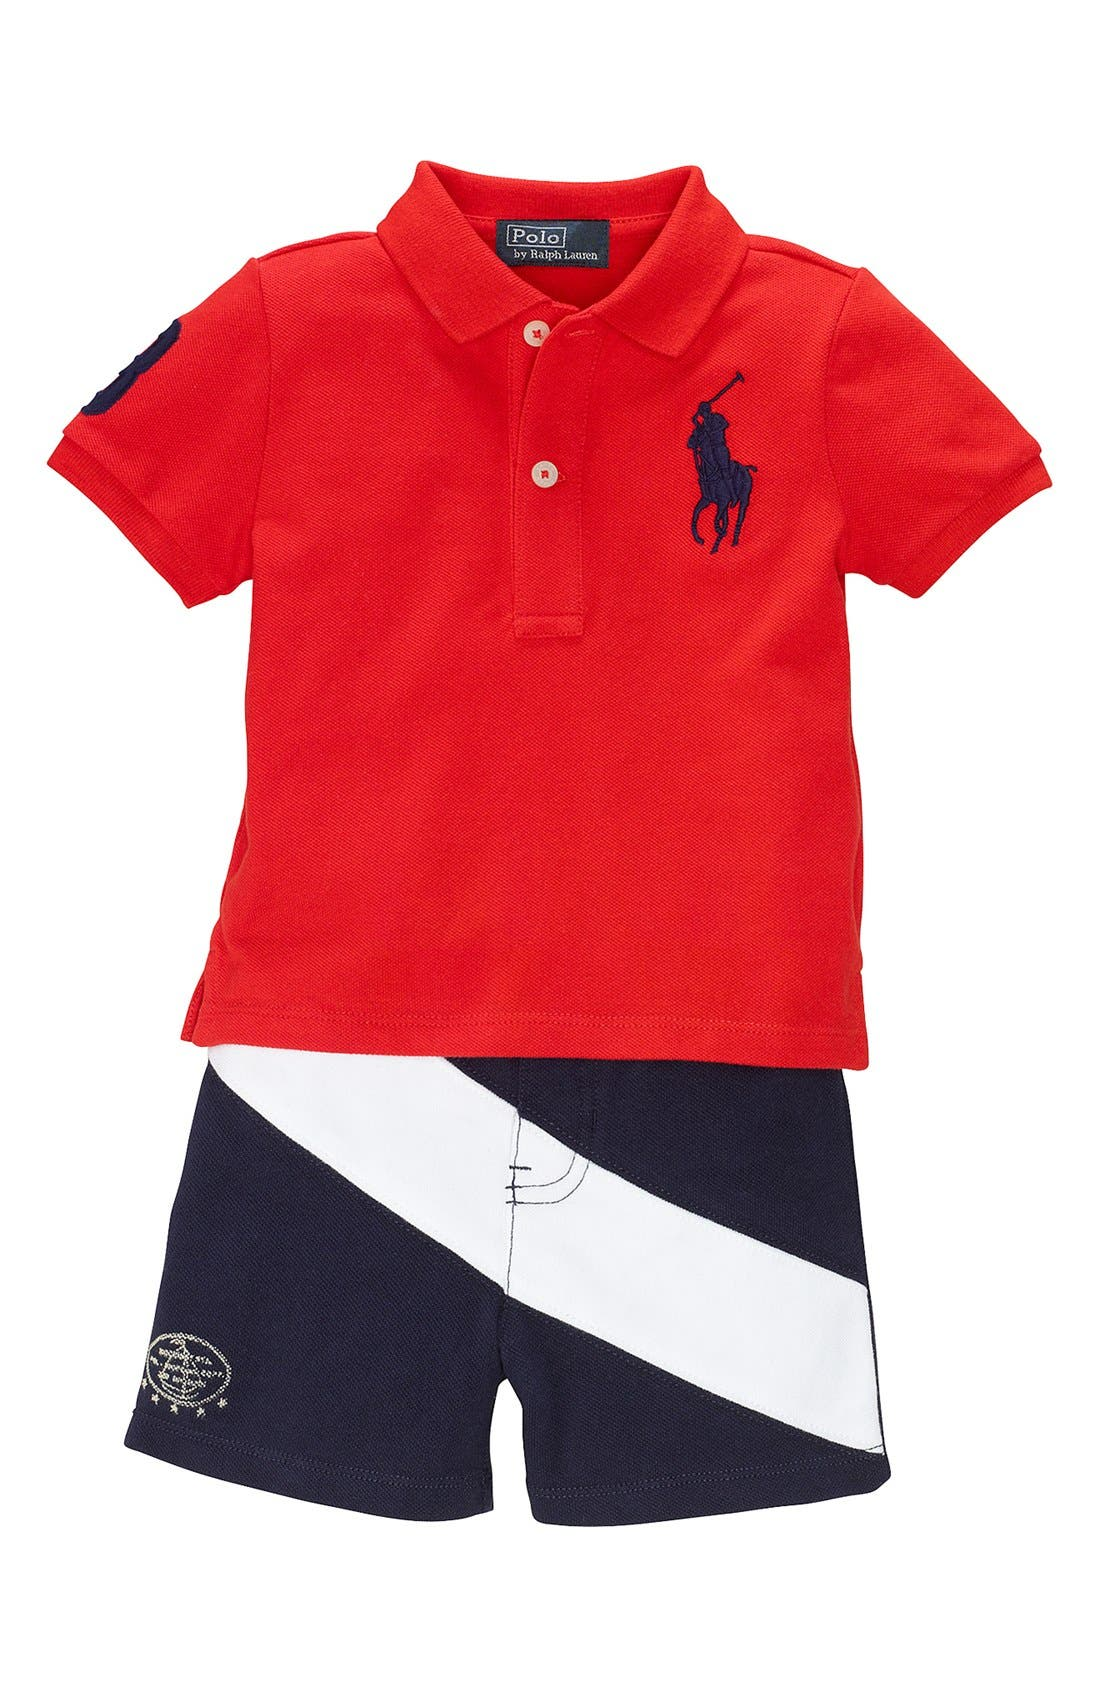 Alternate Image 1 Selected - Ralph Lauren Polo & Banner Stripe Shorts (Baby Boys)